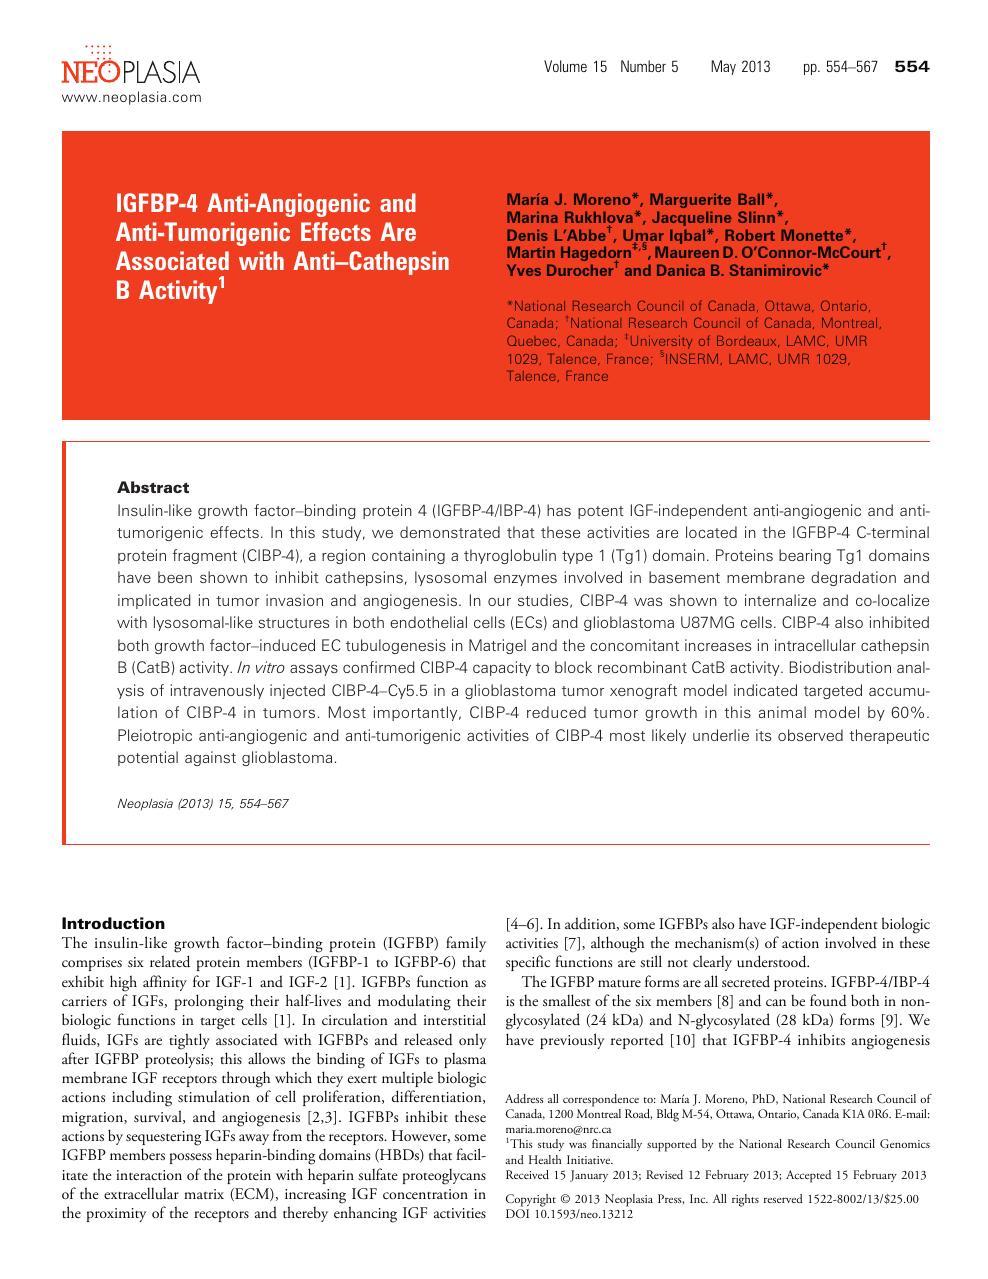 IGFBP-4 Anti-Angiogenic and Anti-Tumorigenic Effects Are